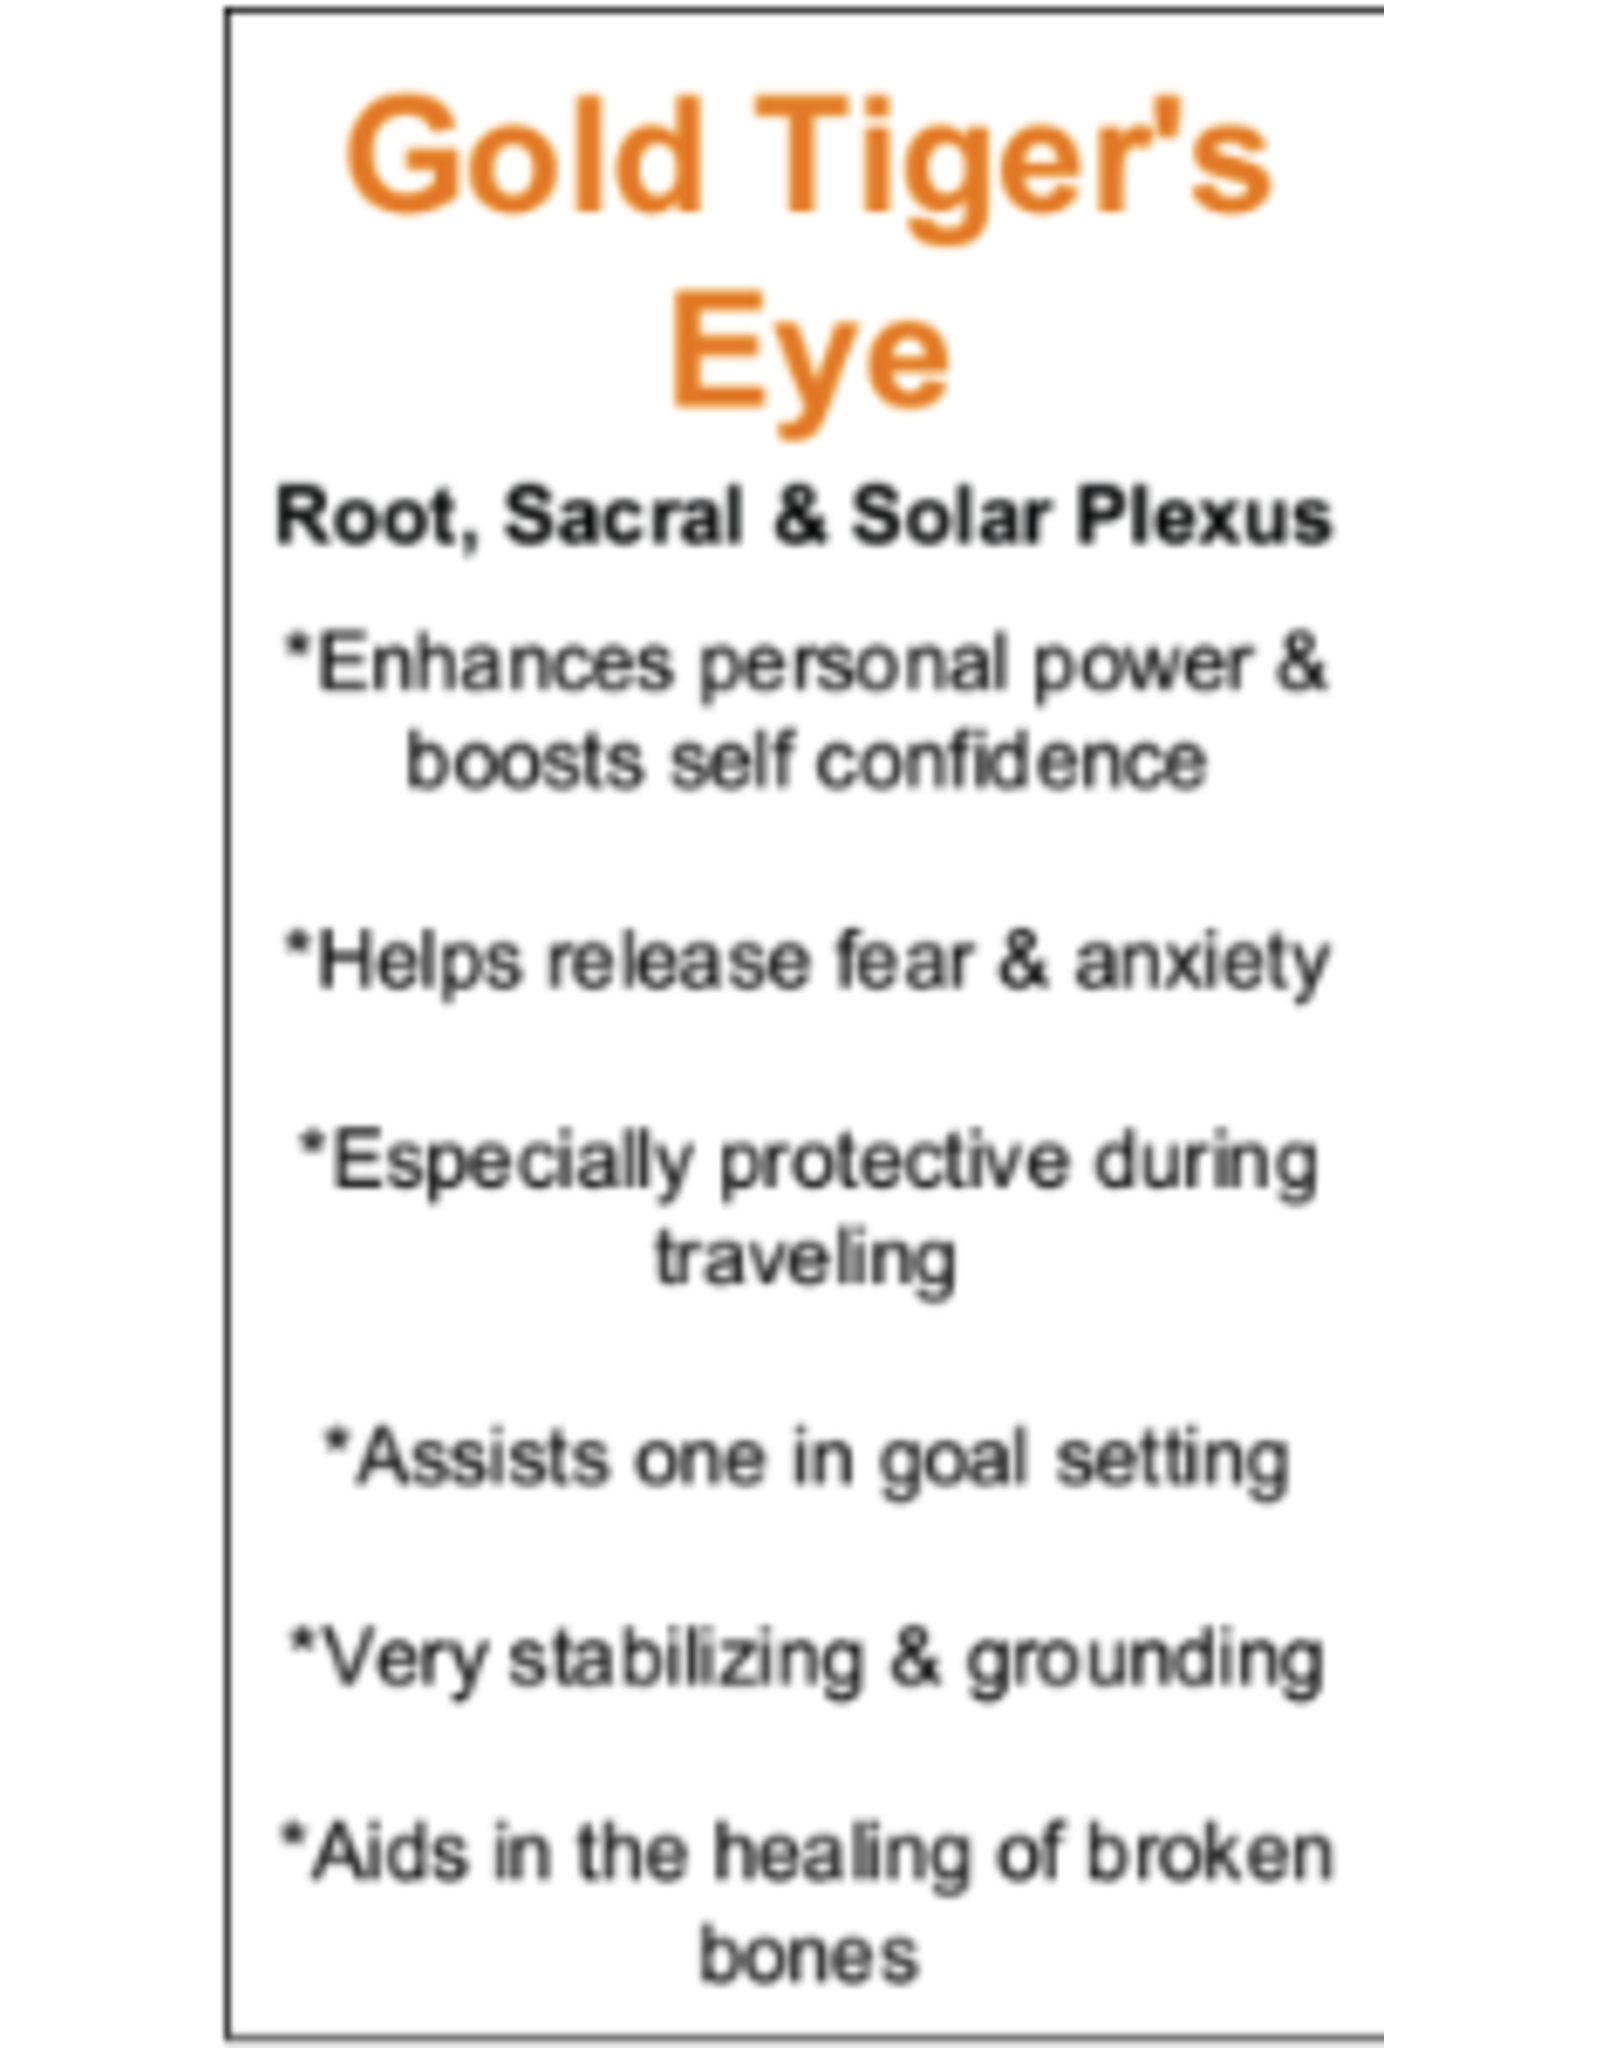 Gold Tigers Eye Chambered Cone Pendulum